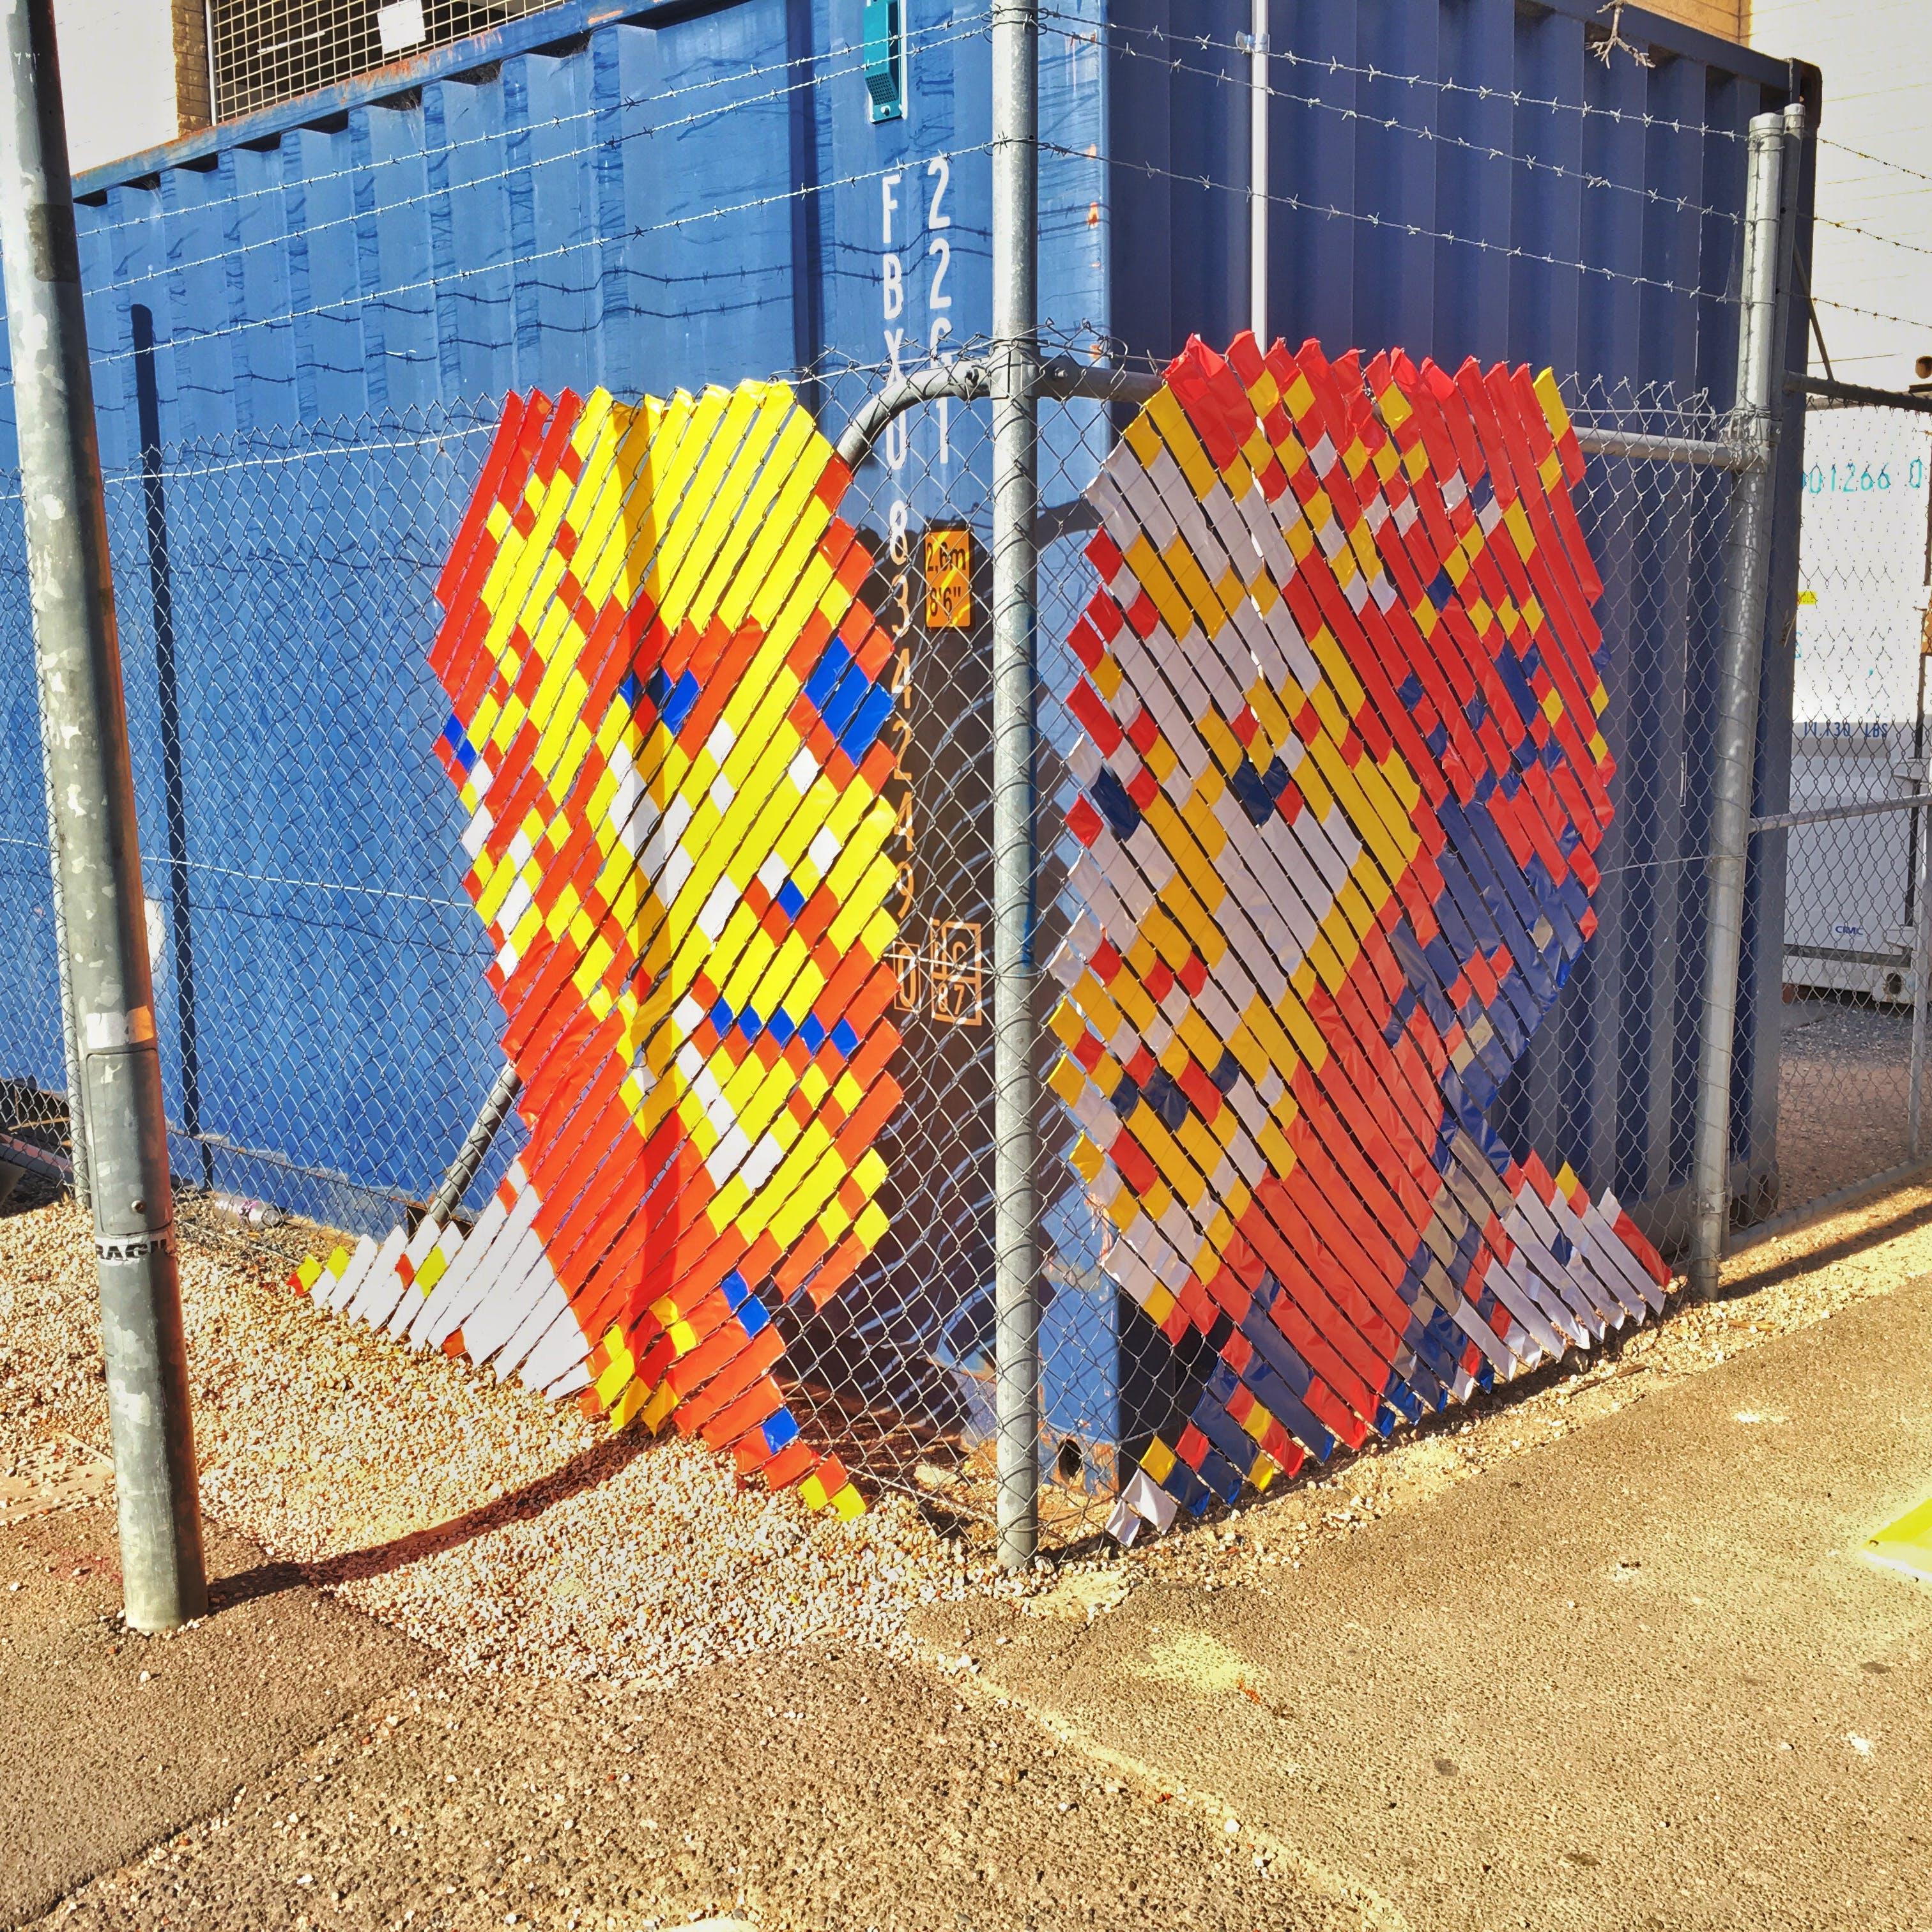 Clarendon Street Tape Art (John Denlay, 2016)